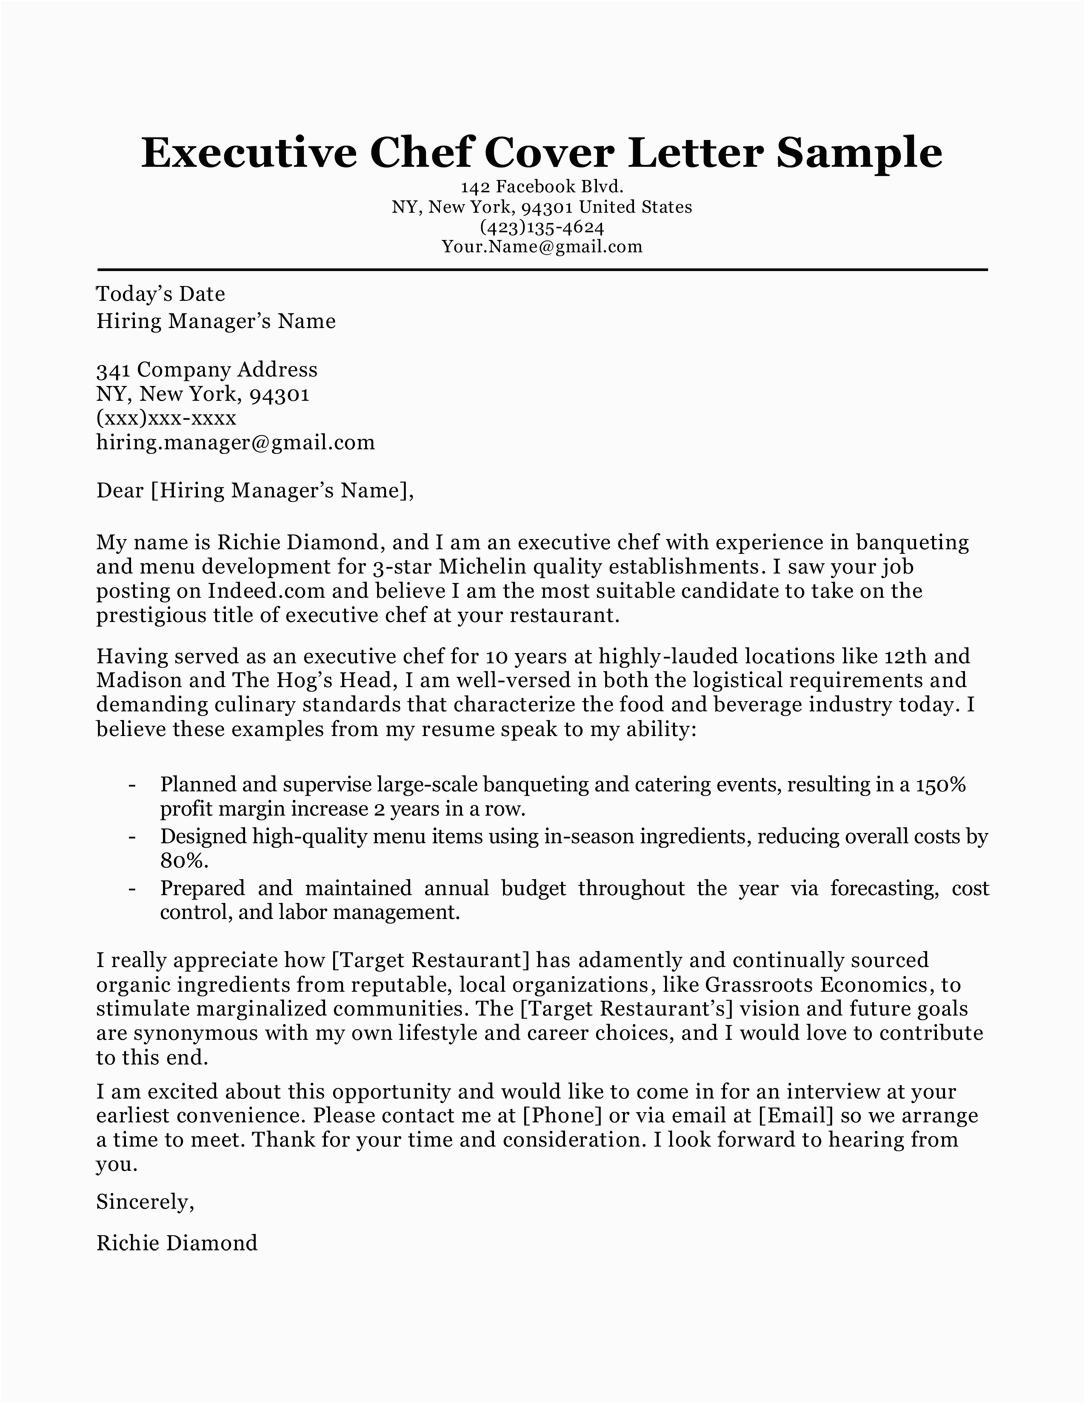 Sample Cover Letter for Chef Resume Chef Cover Letter Sample & Writing Tips